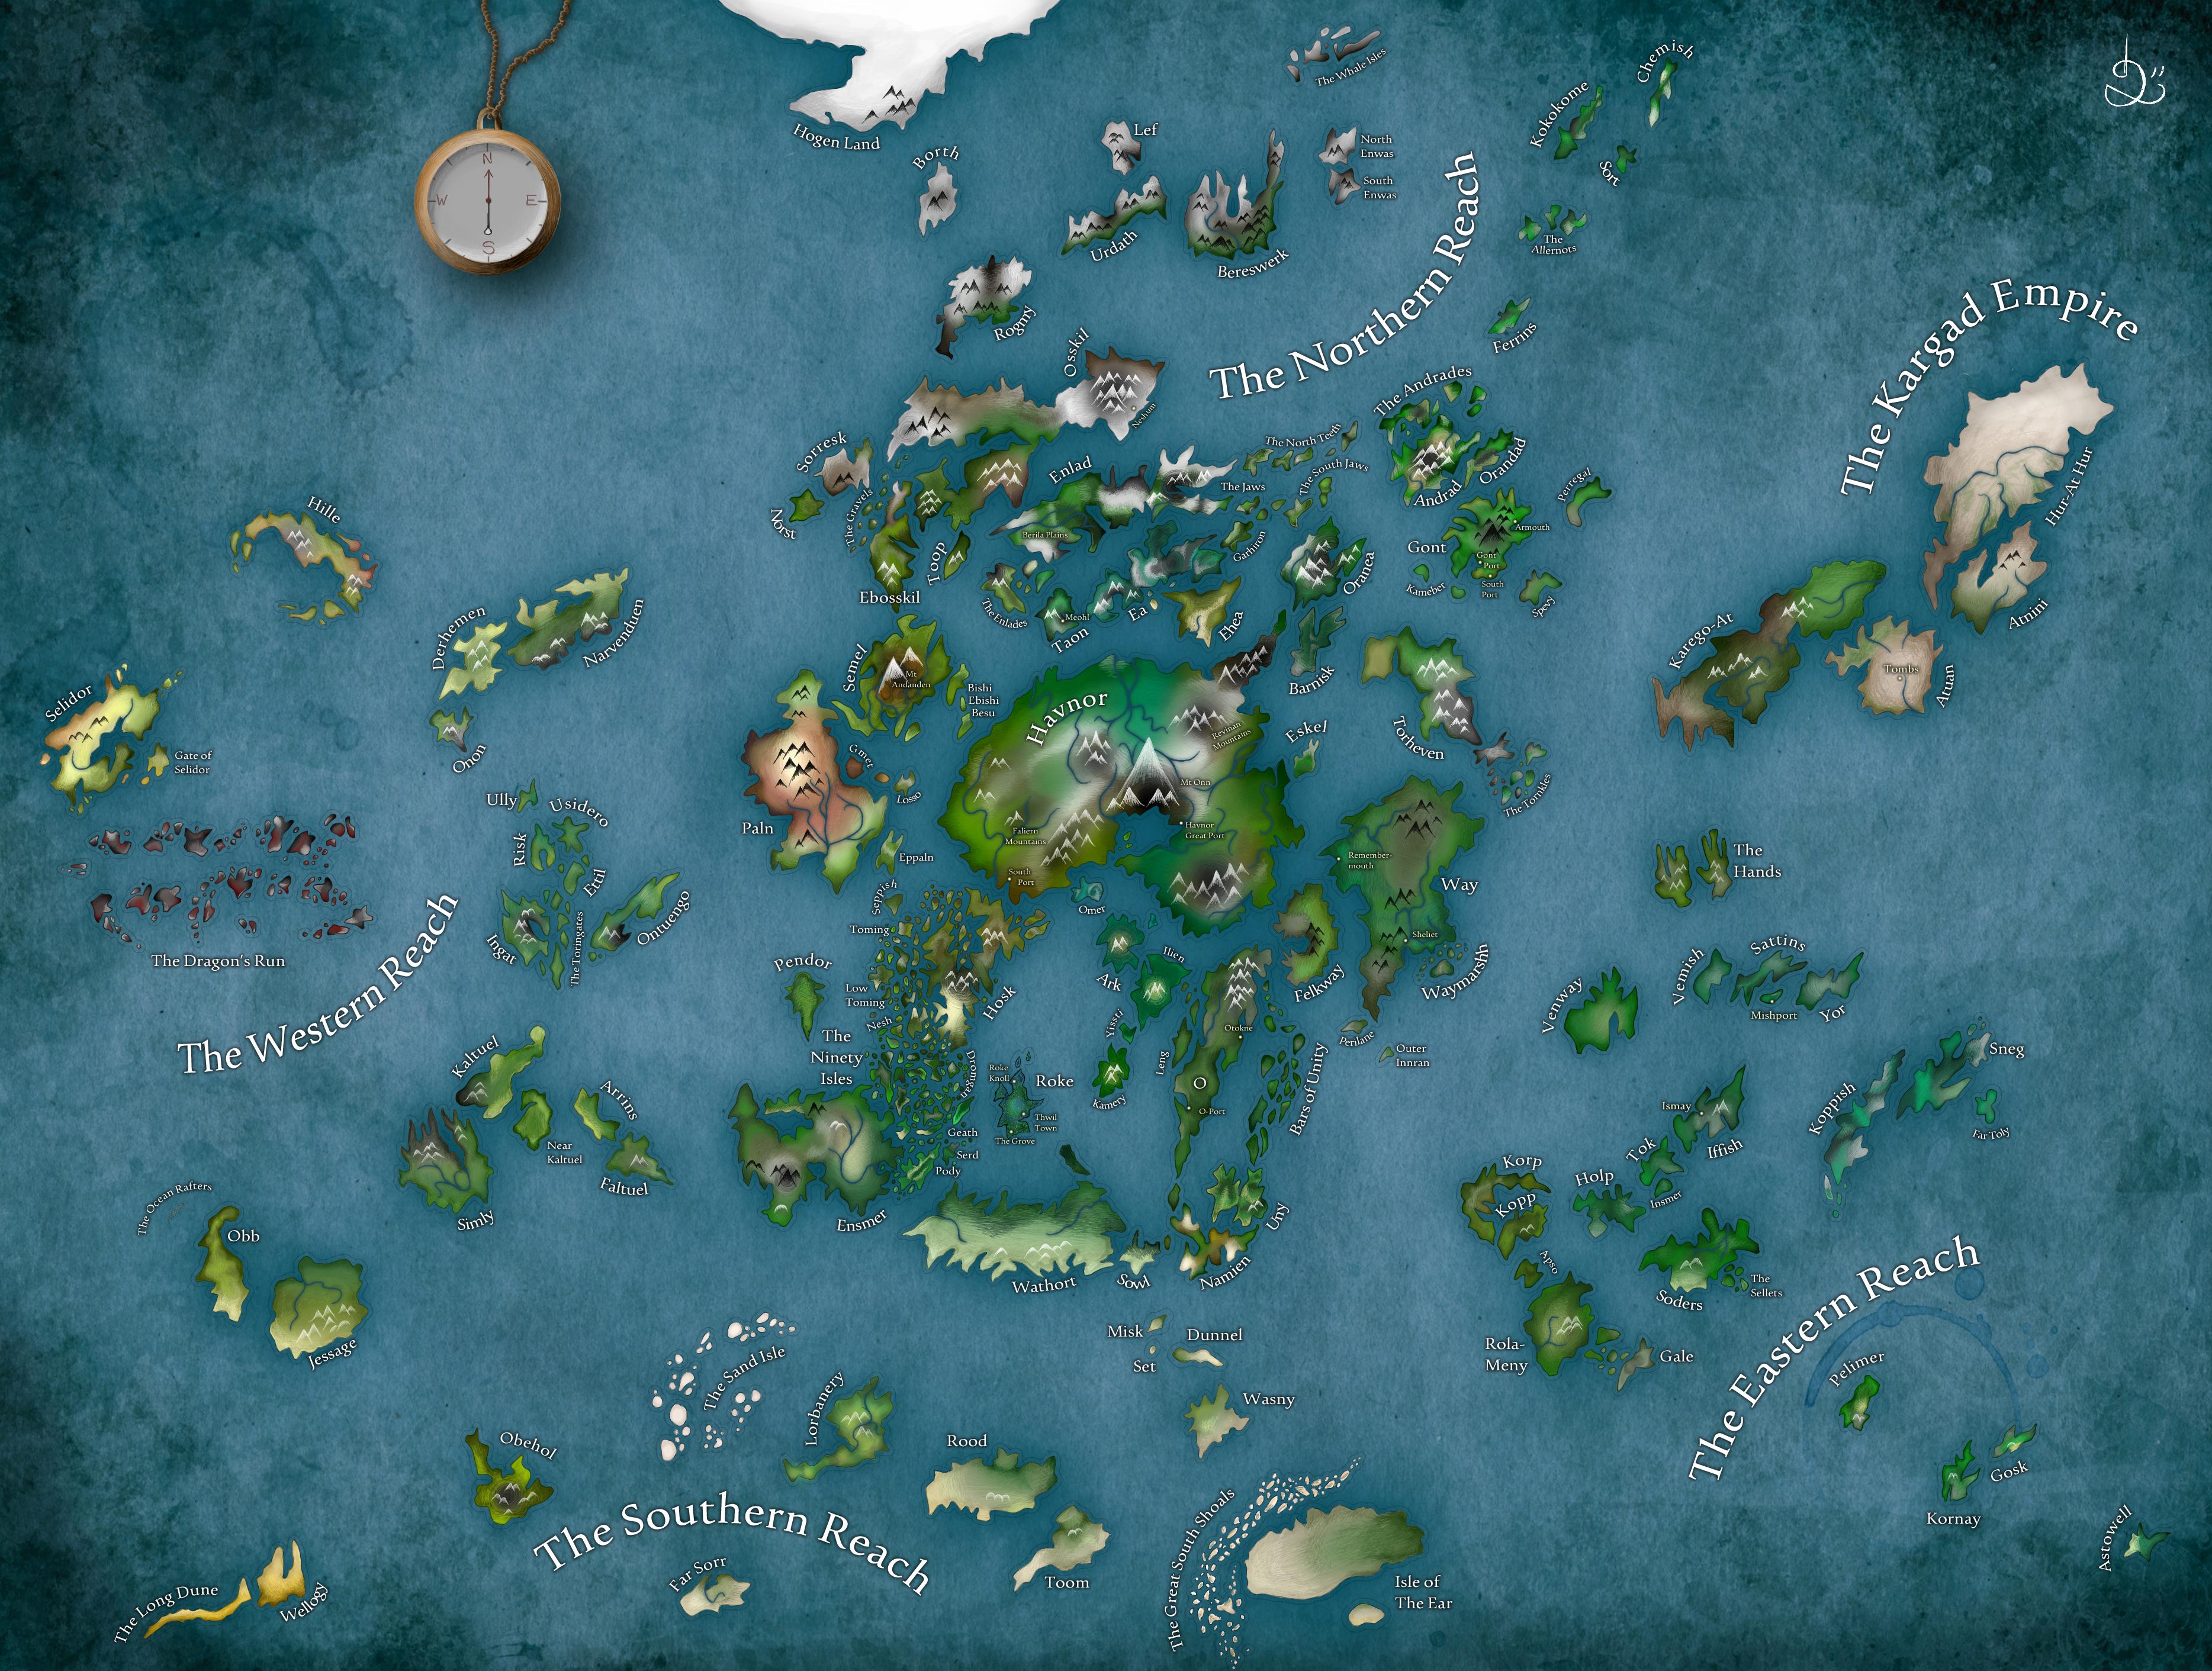 Легенды Архипелага: Земноморье Урсулы Ле Гуин 5